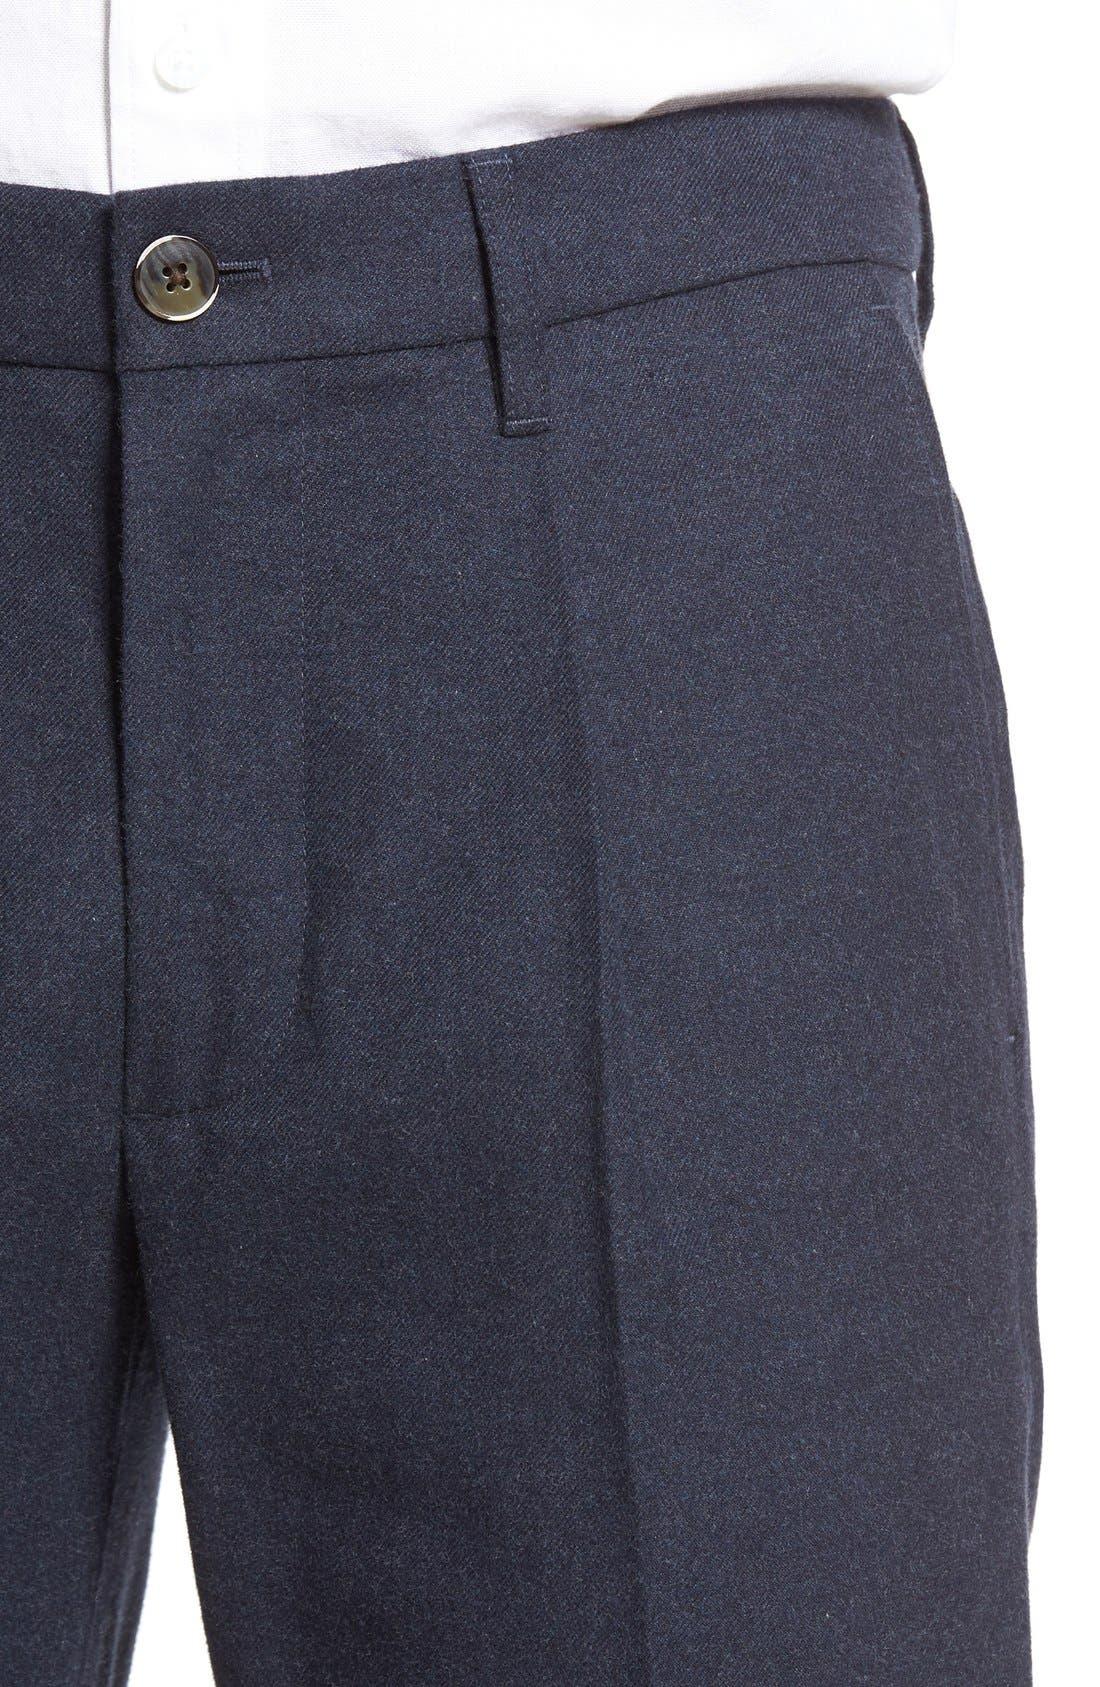 BONOBOS,                             Slim Fit Flannel Trousers,                             Alternate thumbnail 7, color,                             400